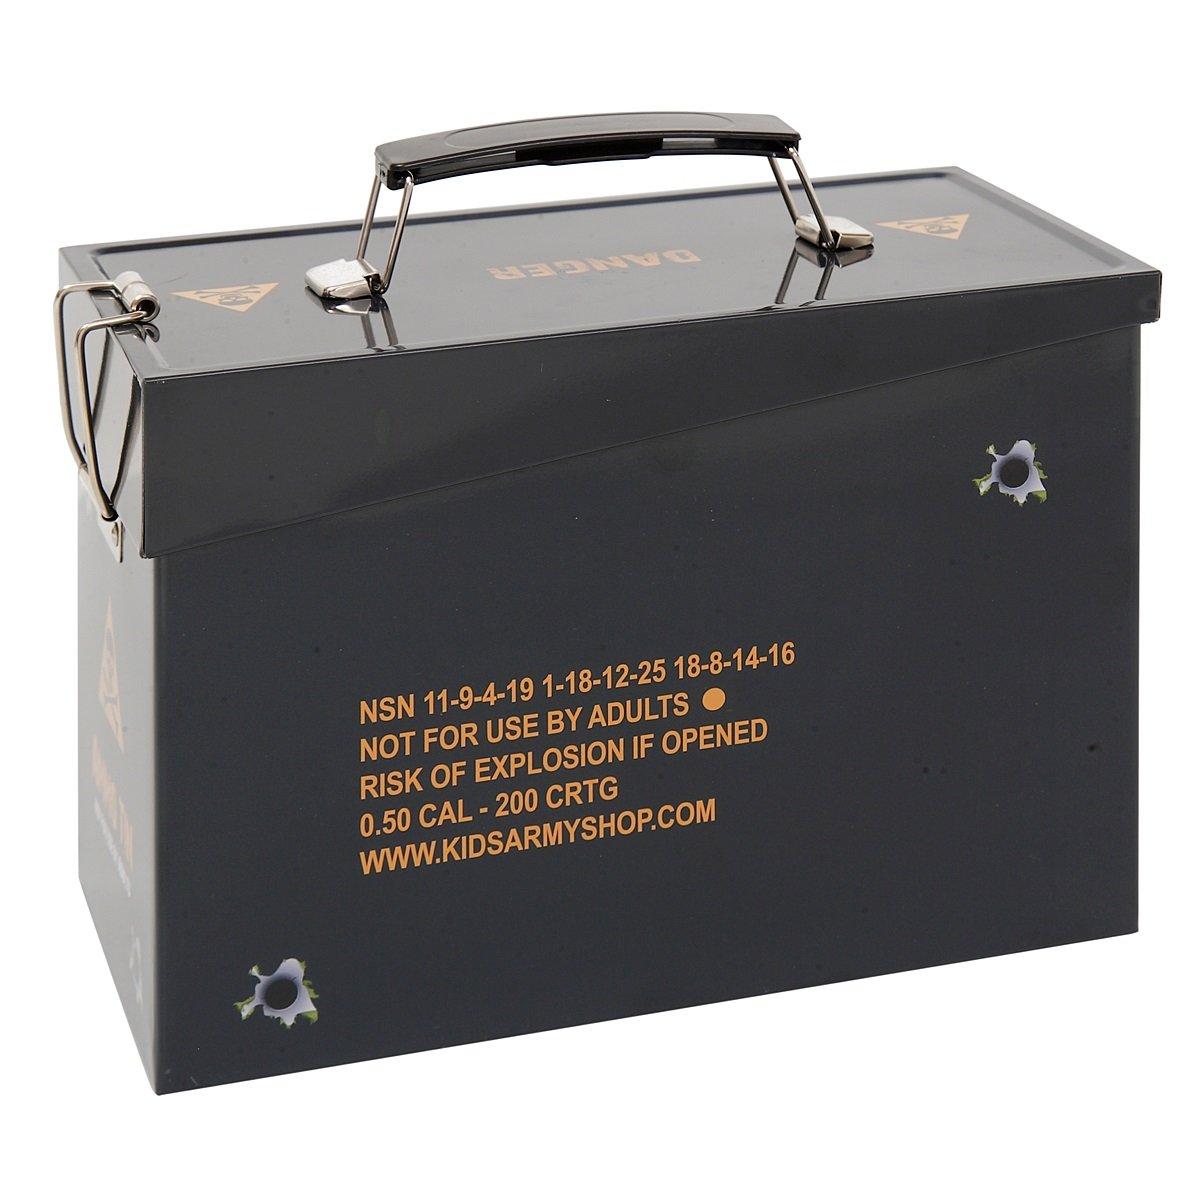 Kids Army Ammo Tin - Toy Storage Tin - Camouflage Ammo Box